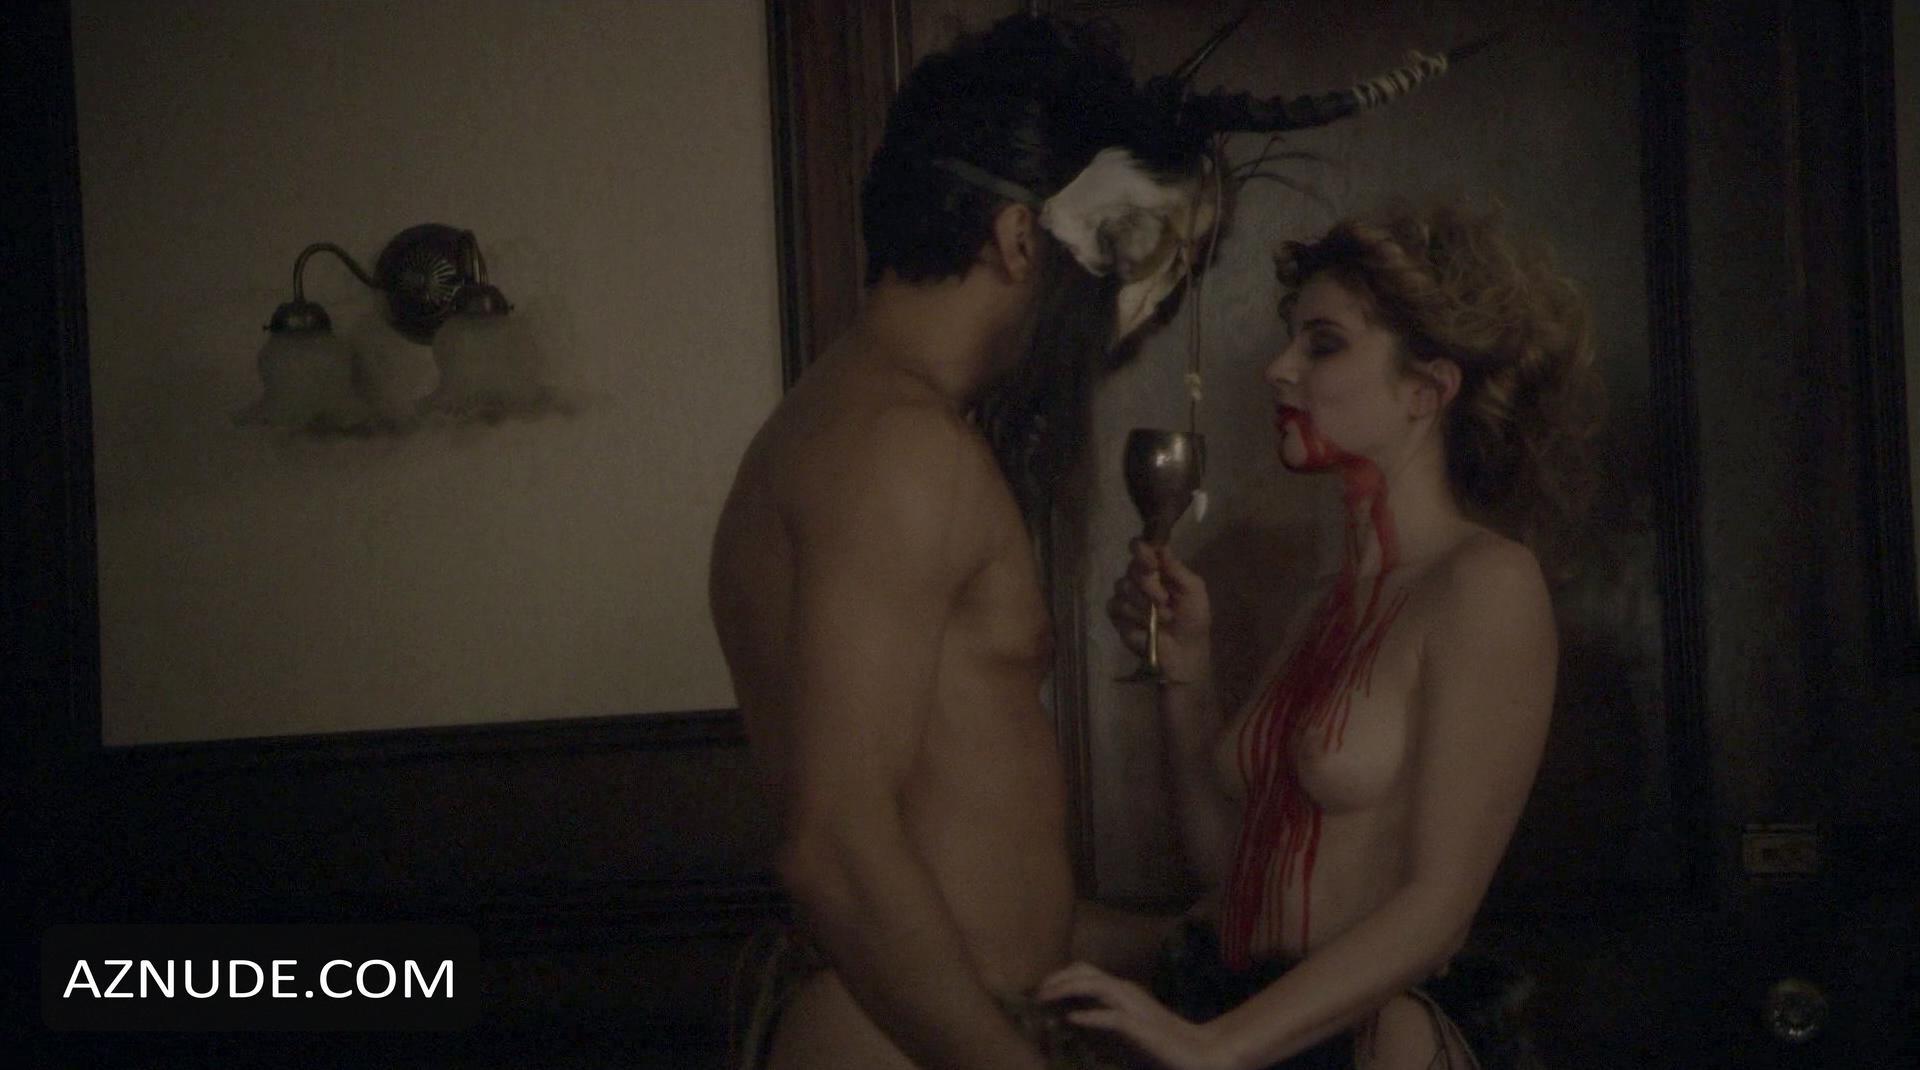 Newest nude scenes